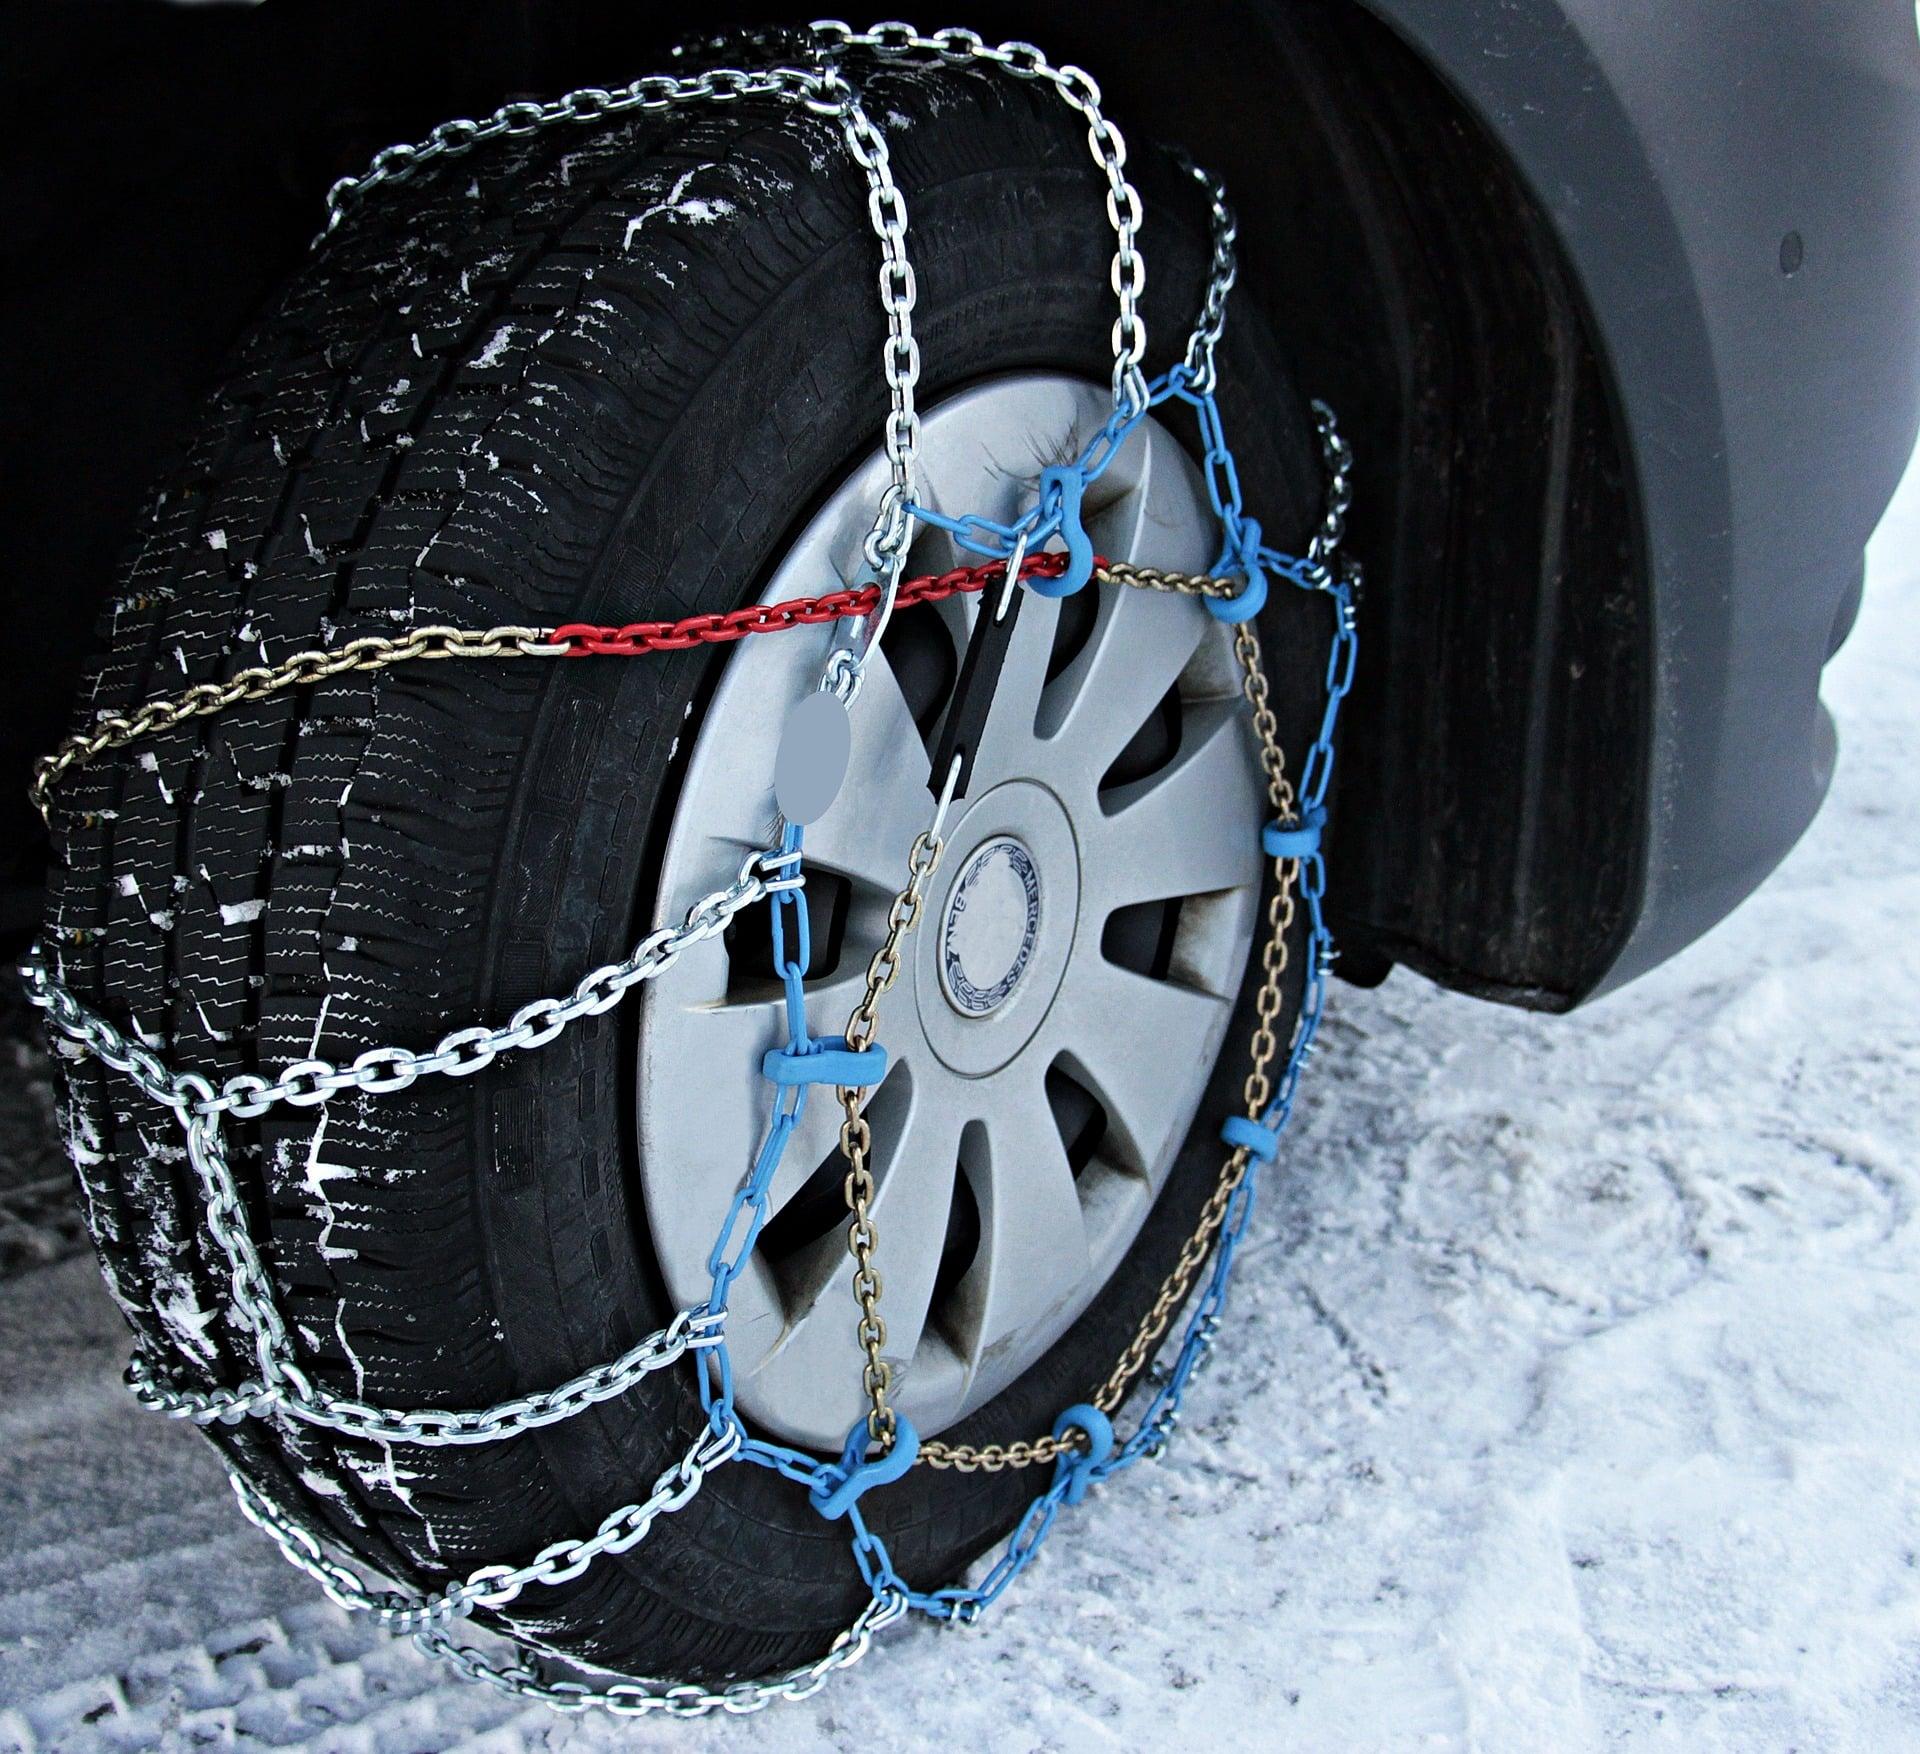 snow-chains-3029596_1920